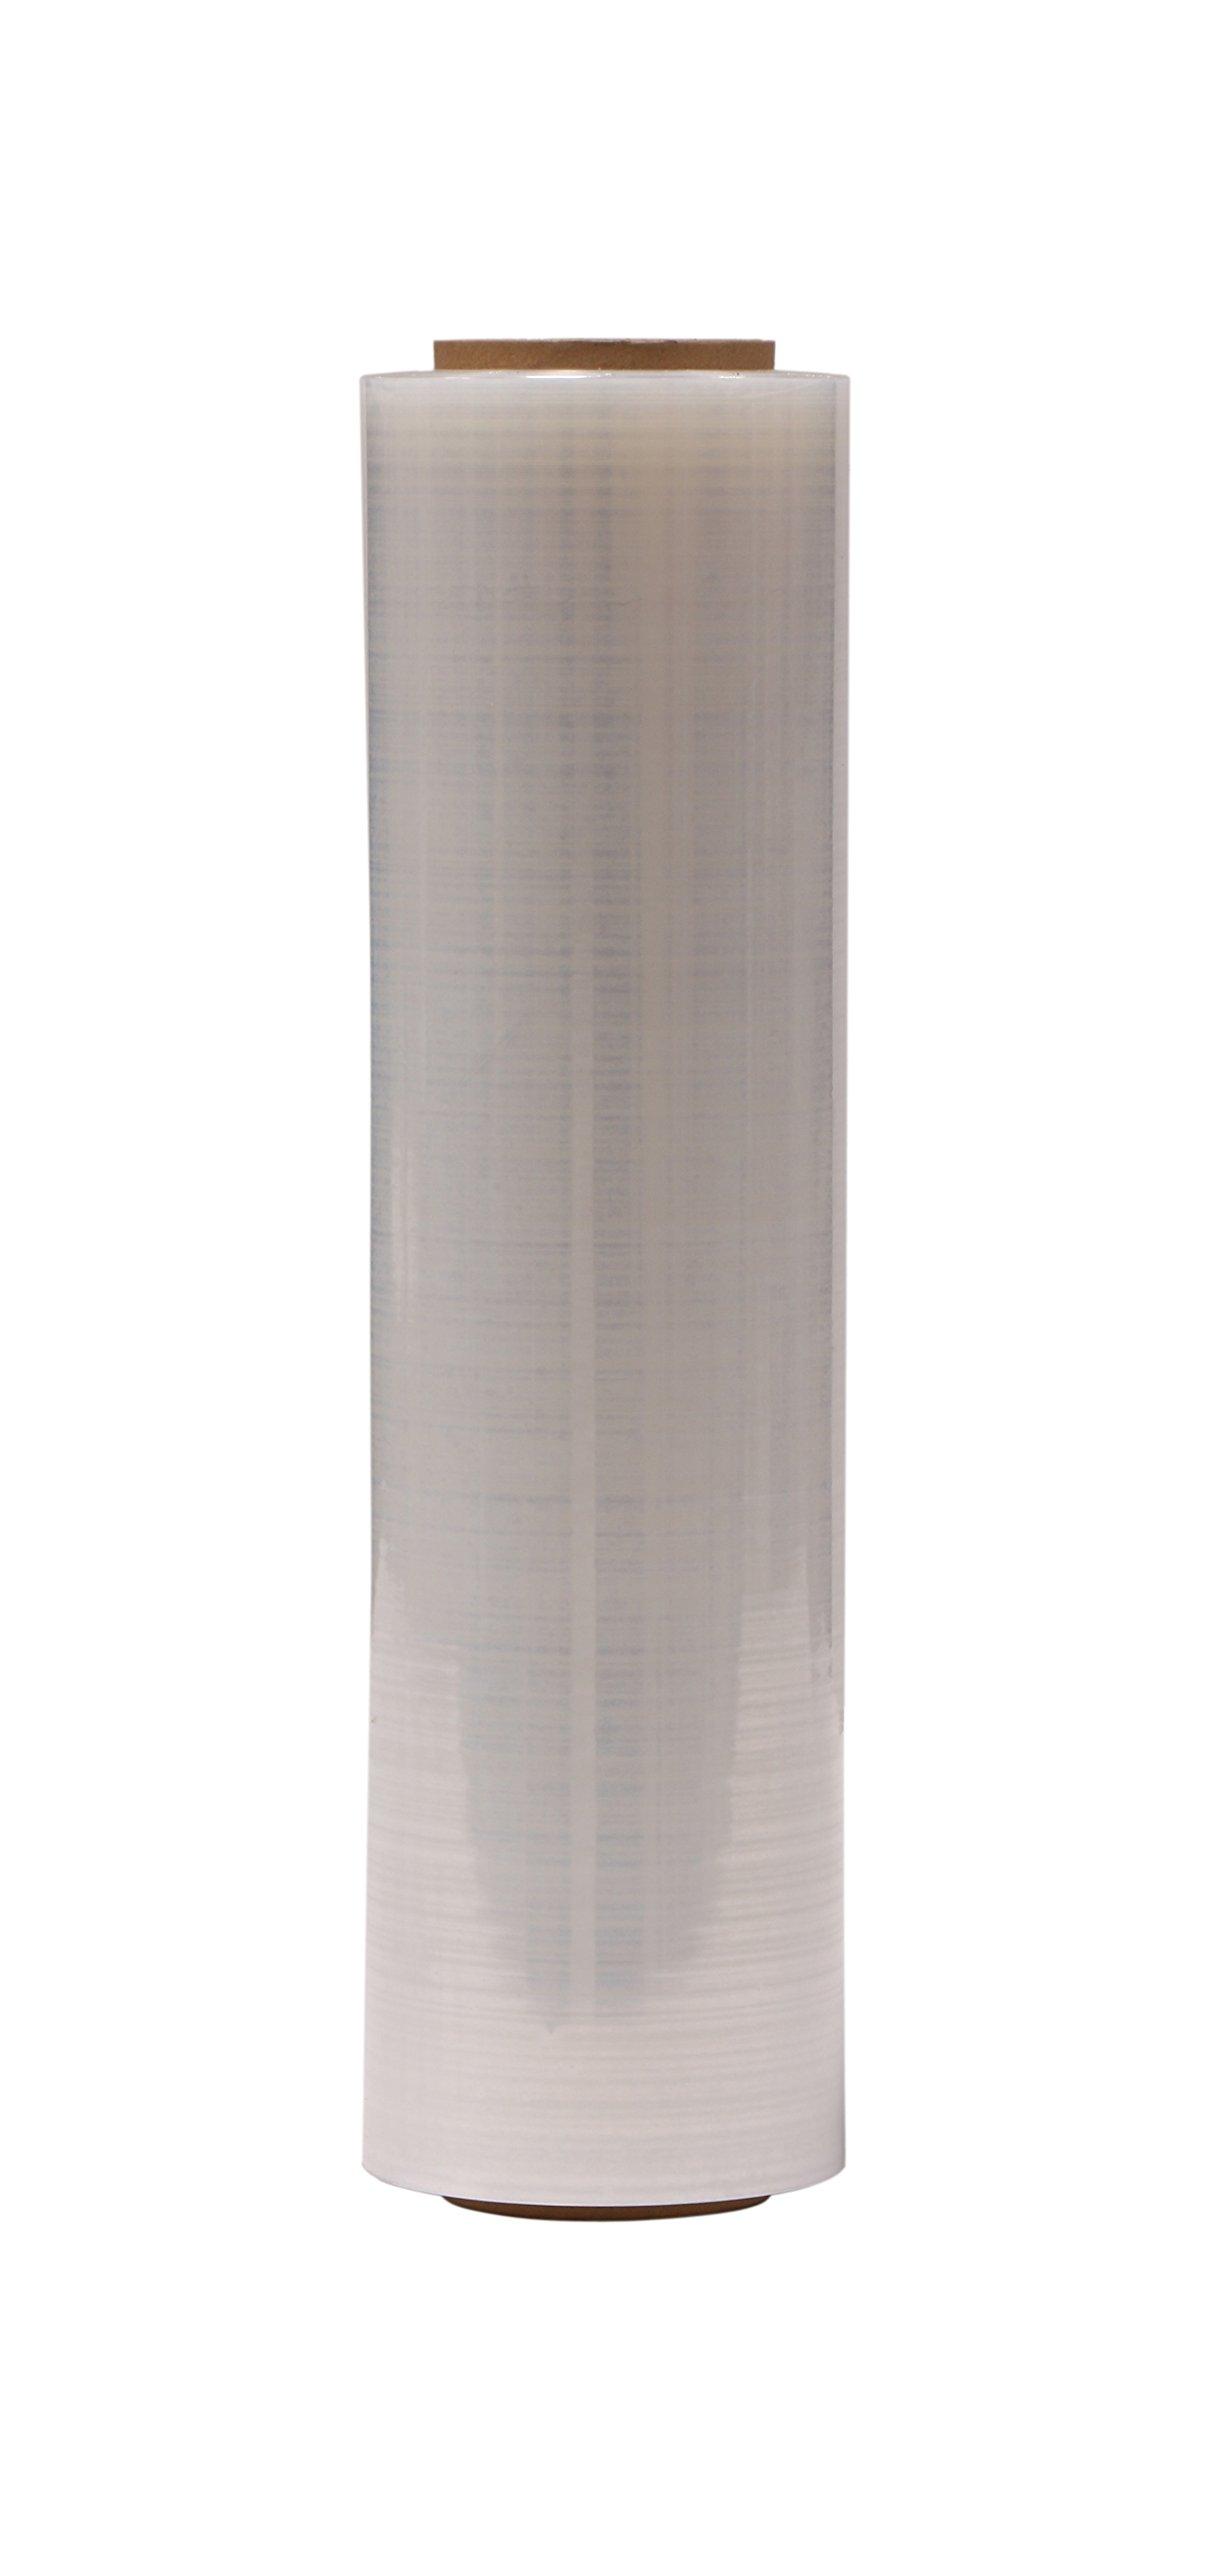 "AMERIQUE Shrink Wrap 1000FTX18"", 6.3LB Per Roll, Stretch Film Plastic Wrap - Industrial Strength Hand Stretch Wrap, 18""x 1,500 FT Per Roll, 80 Gauge Shrink Film / Pallet Wrap – Clear"